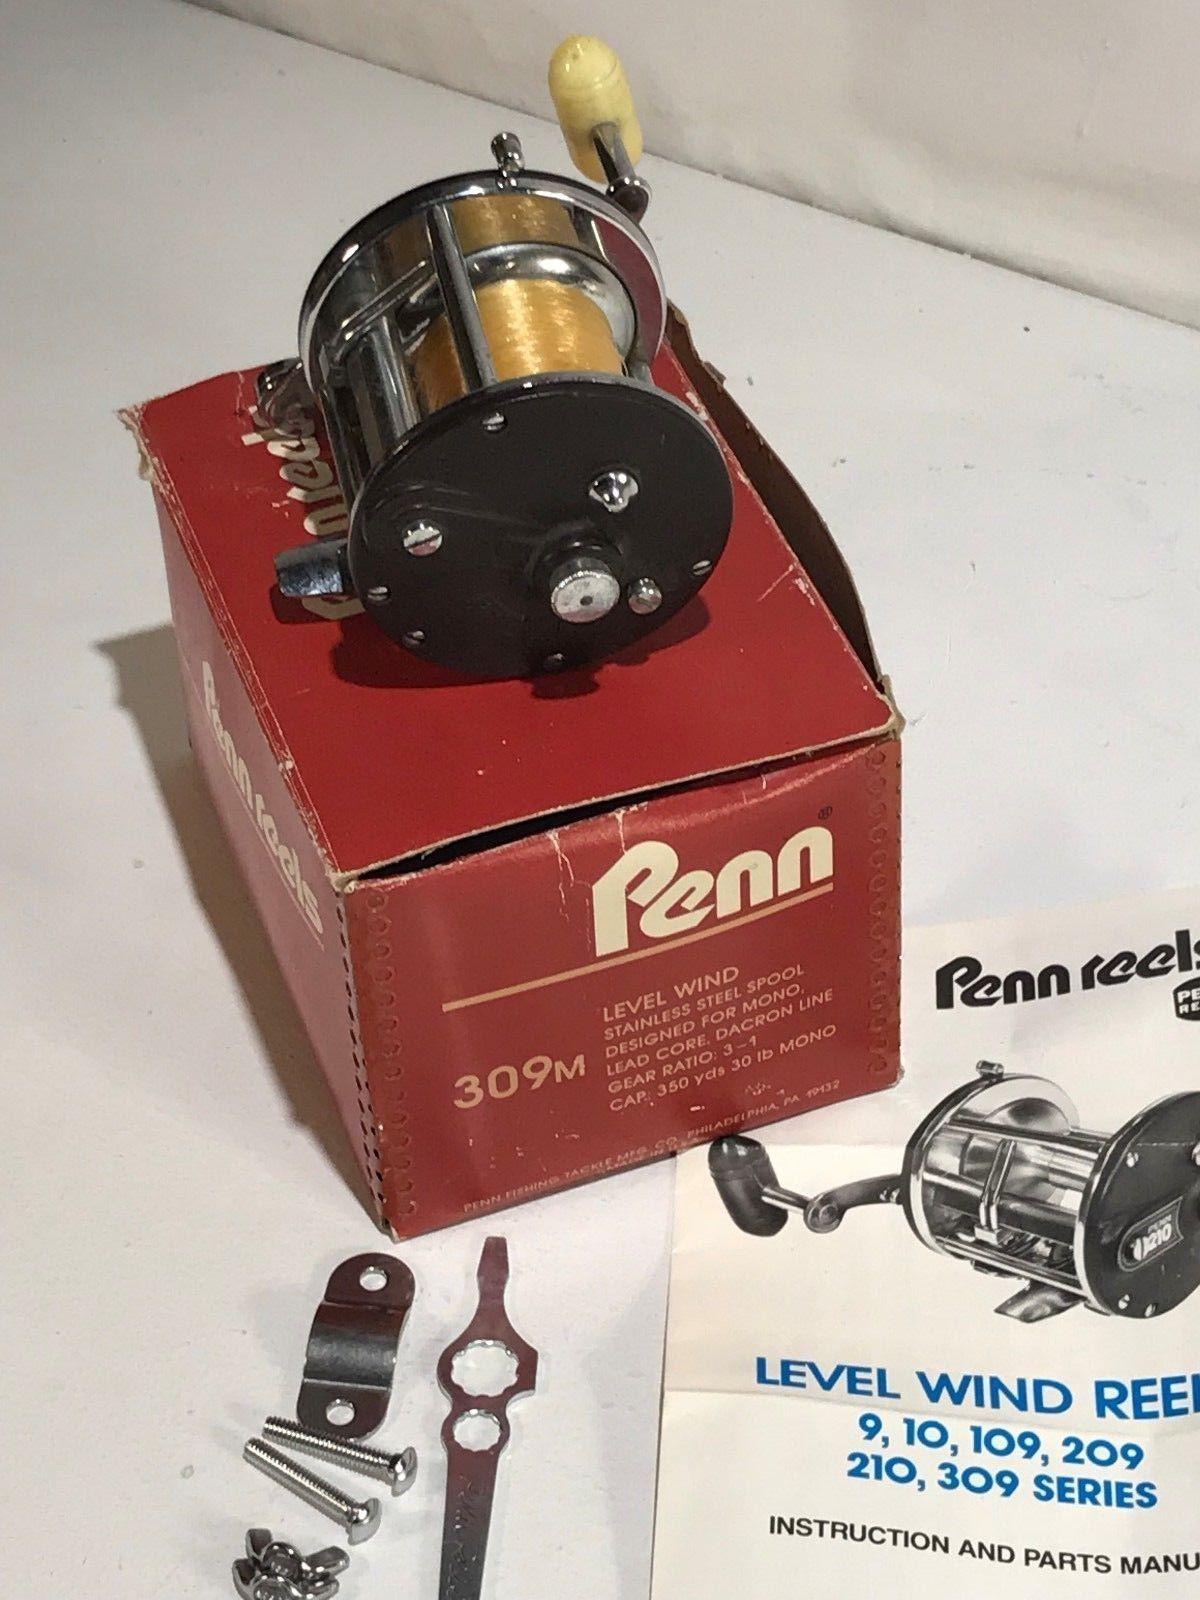 Penn 309 Level Wind Parts Diagram Schematic Diagrams Reel Vintage Peer 109 Levelwind Fishing Fish Tackle Line Reels